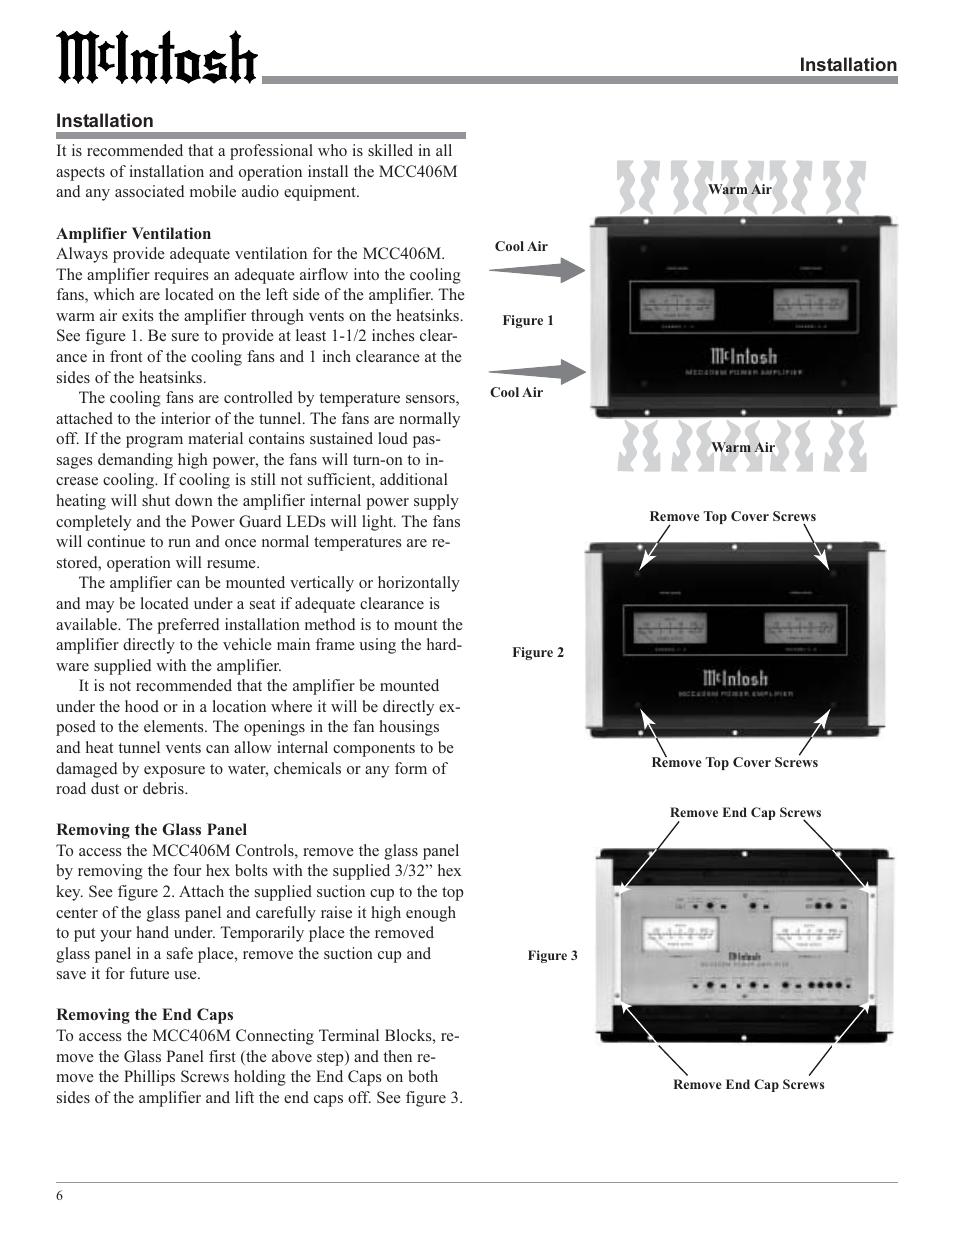 mcintosh mcc406m user manual page 6 24 original mode rh manualsdir com